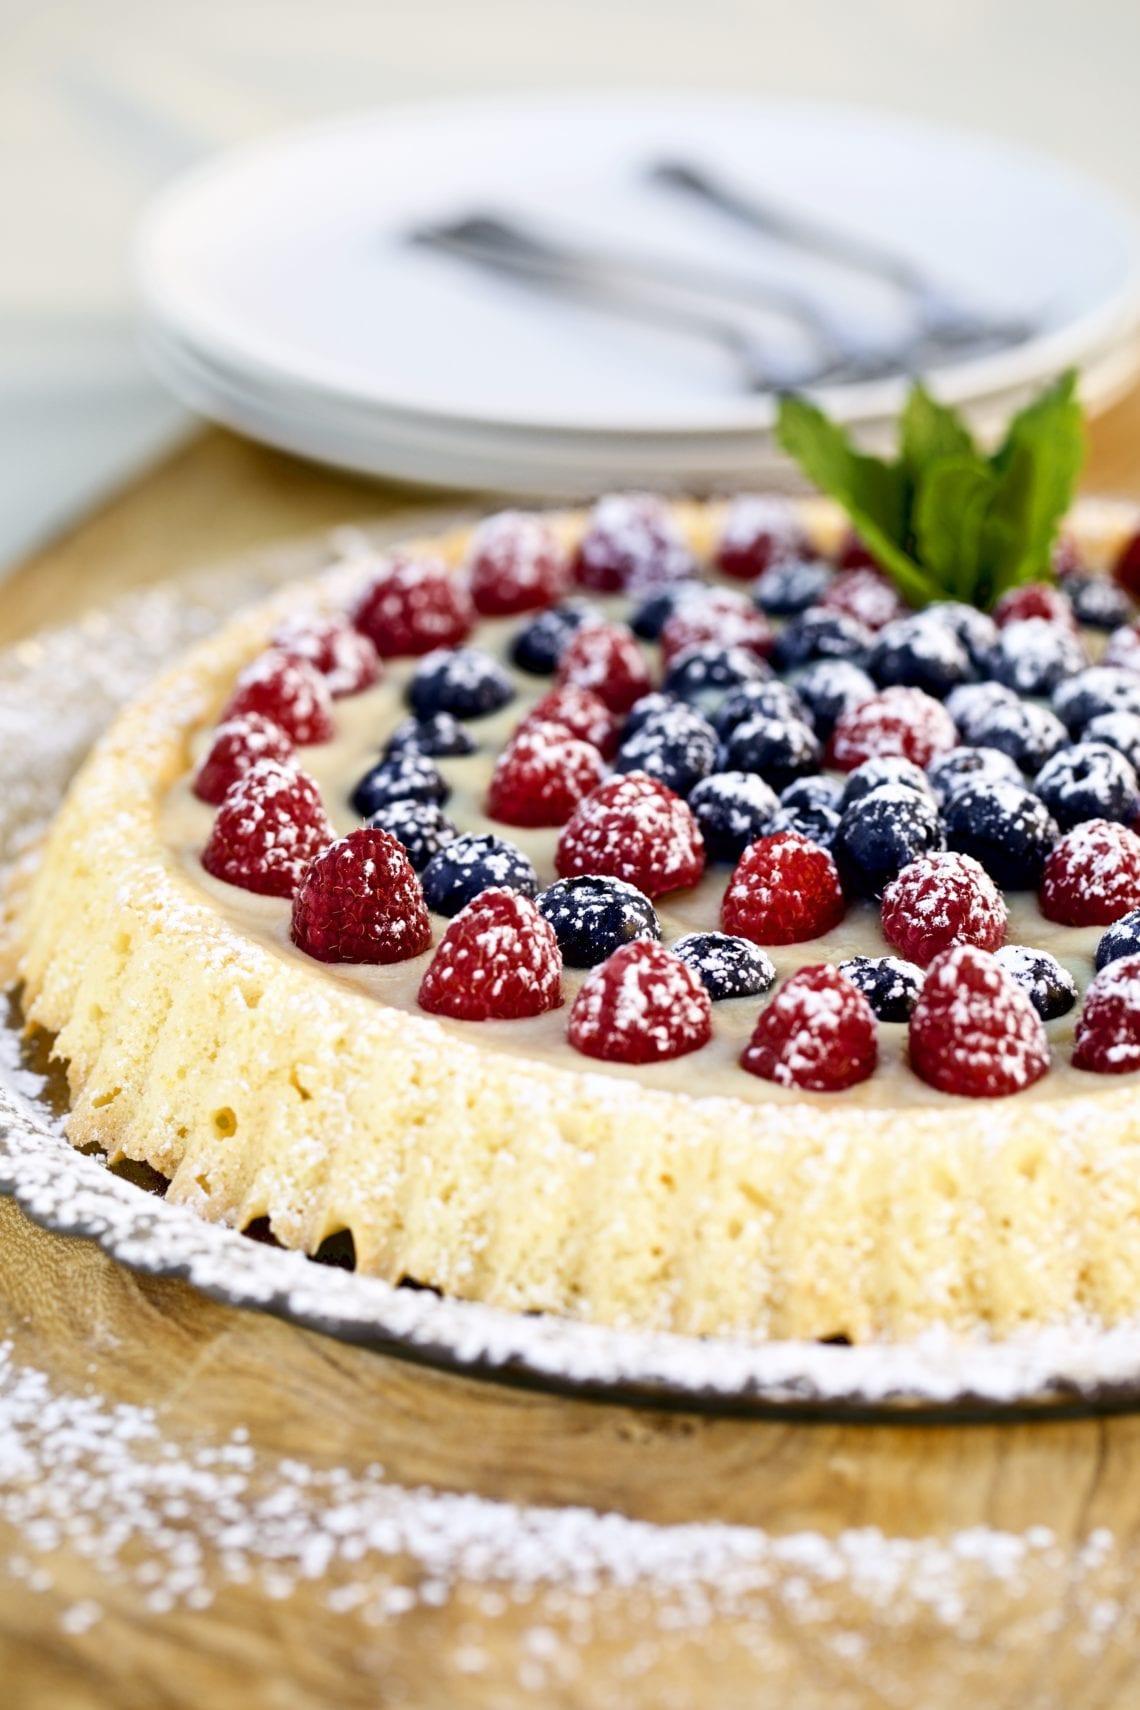 Almond Sponge Cake with Italian Pastry Cream and Berries